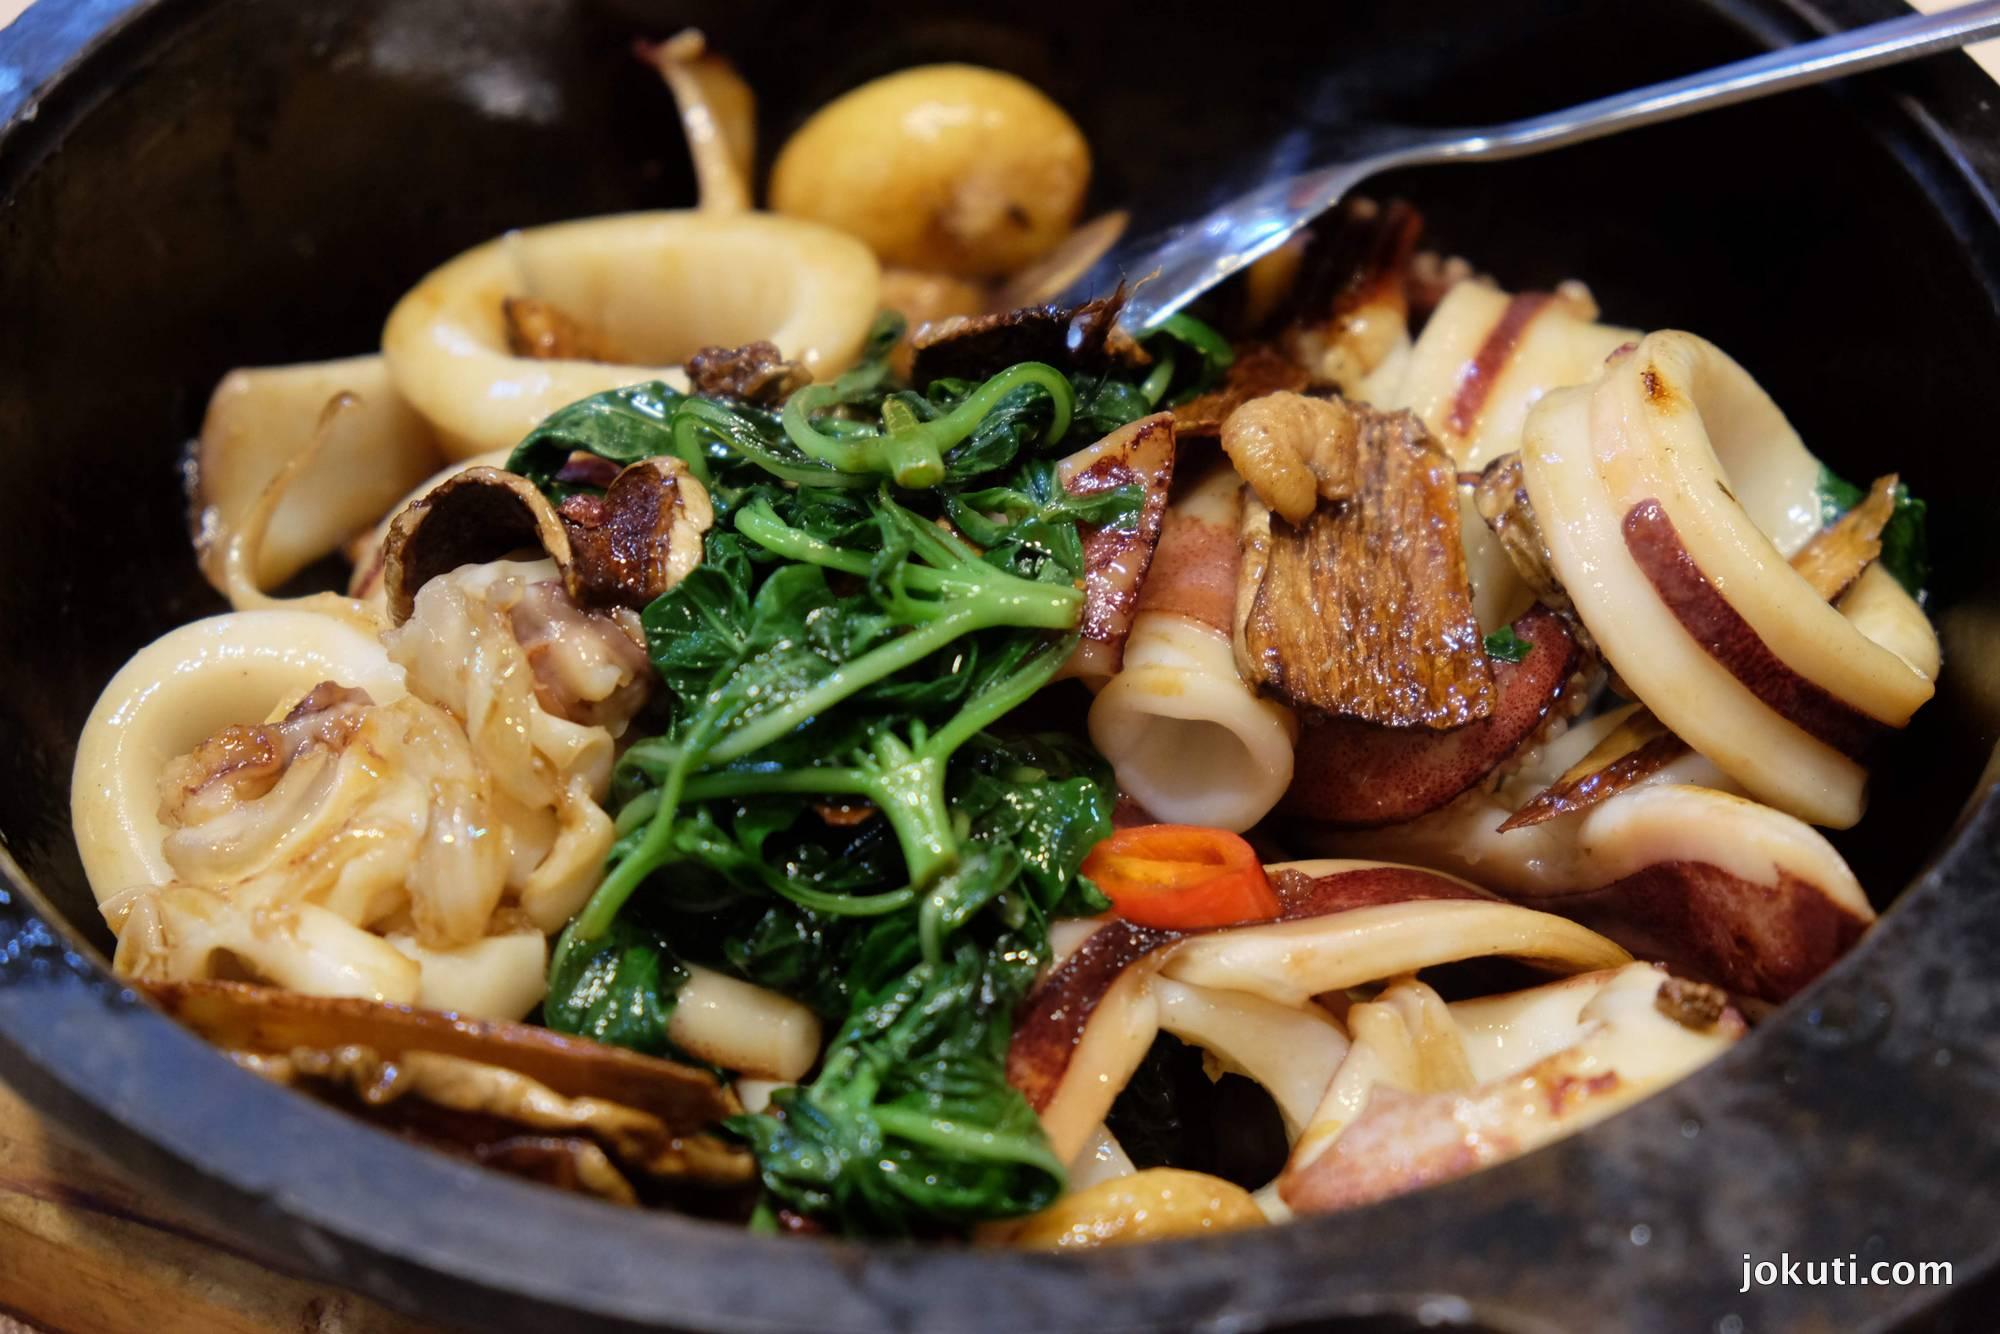 dscf2931_taipei_ming_fu_seafood_michelin_taiwan_vilagevo_jokuti.jpg